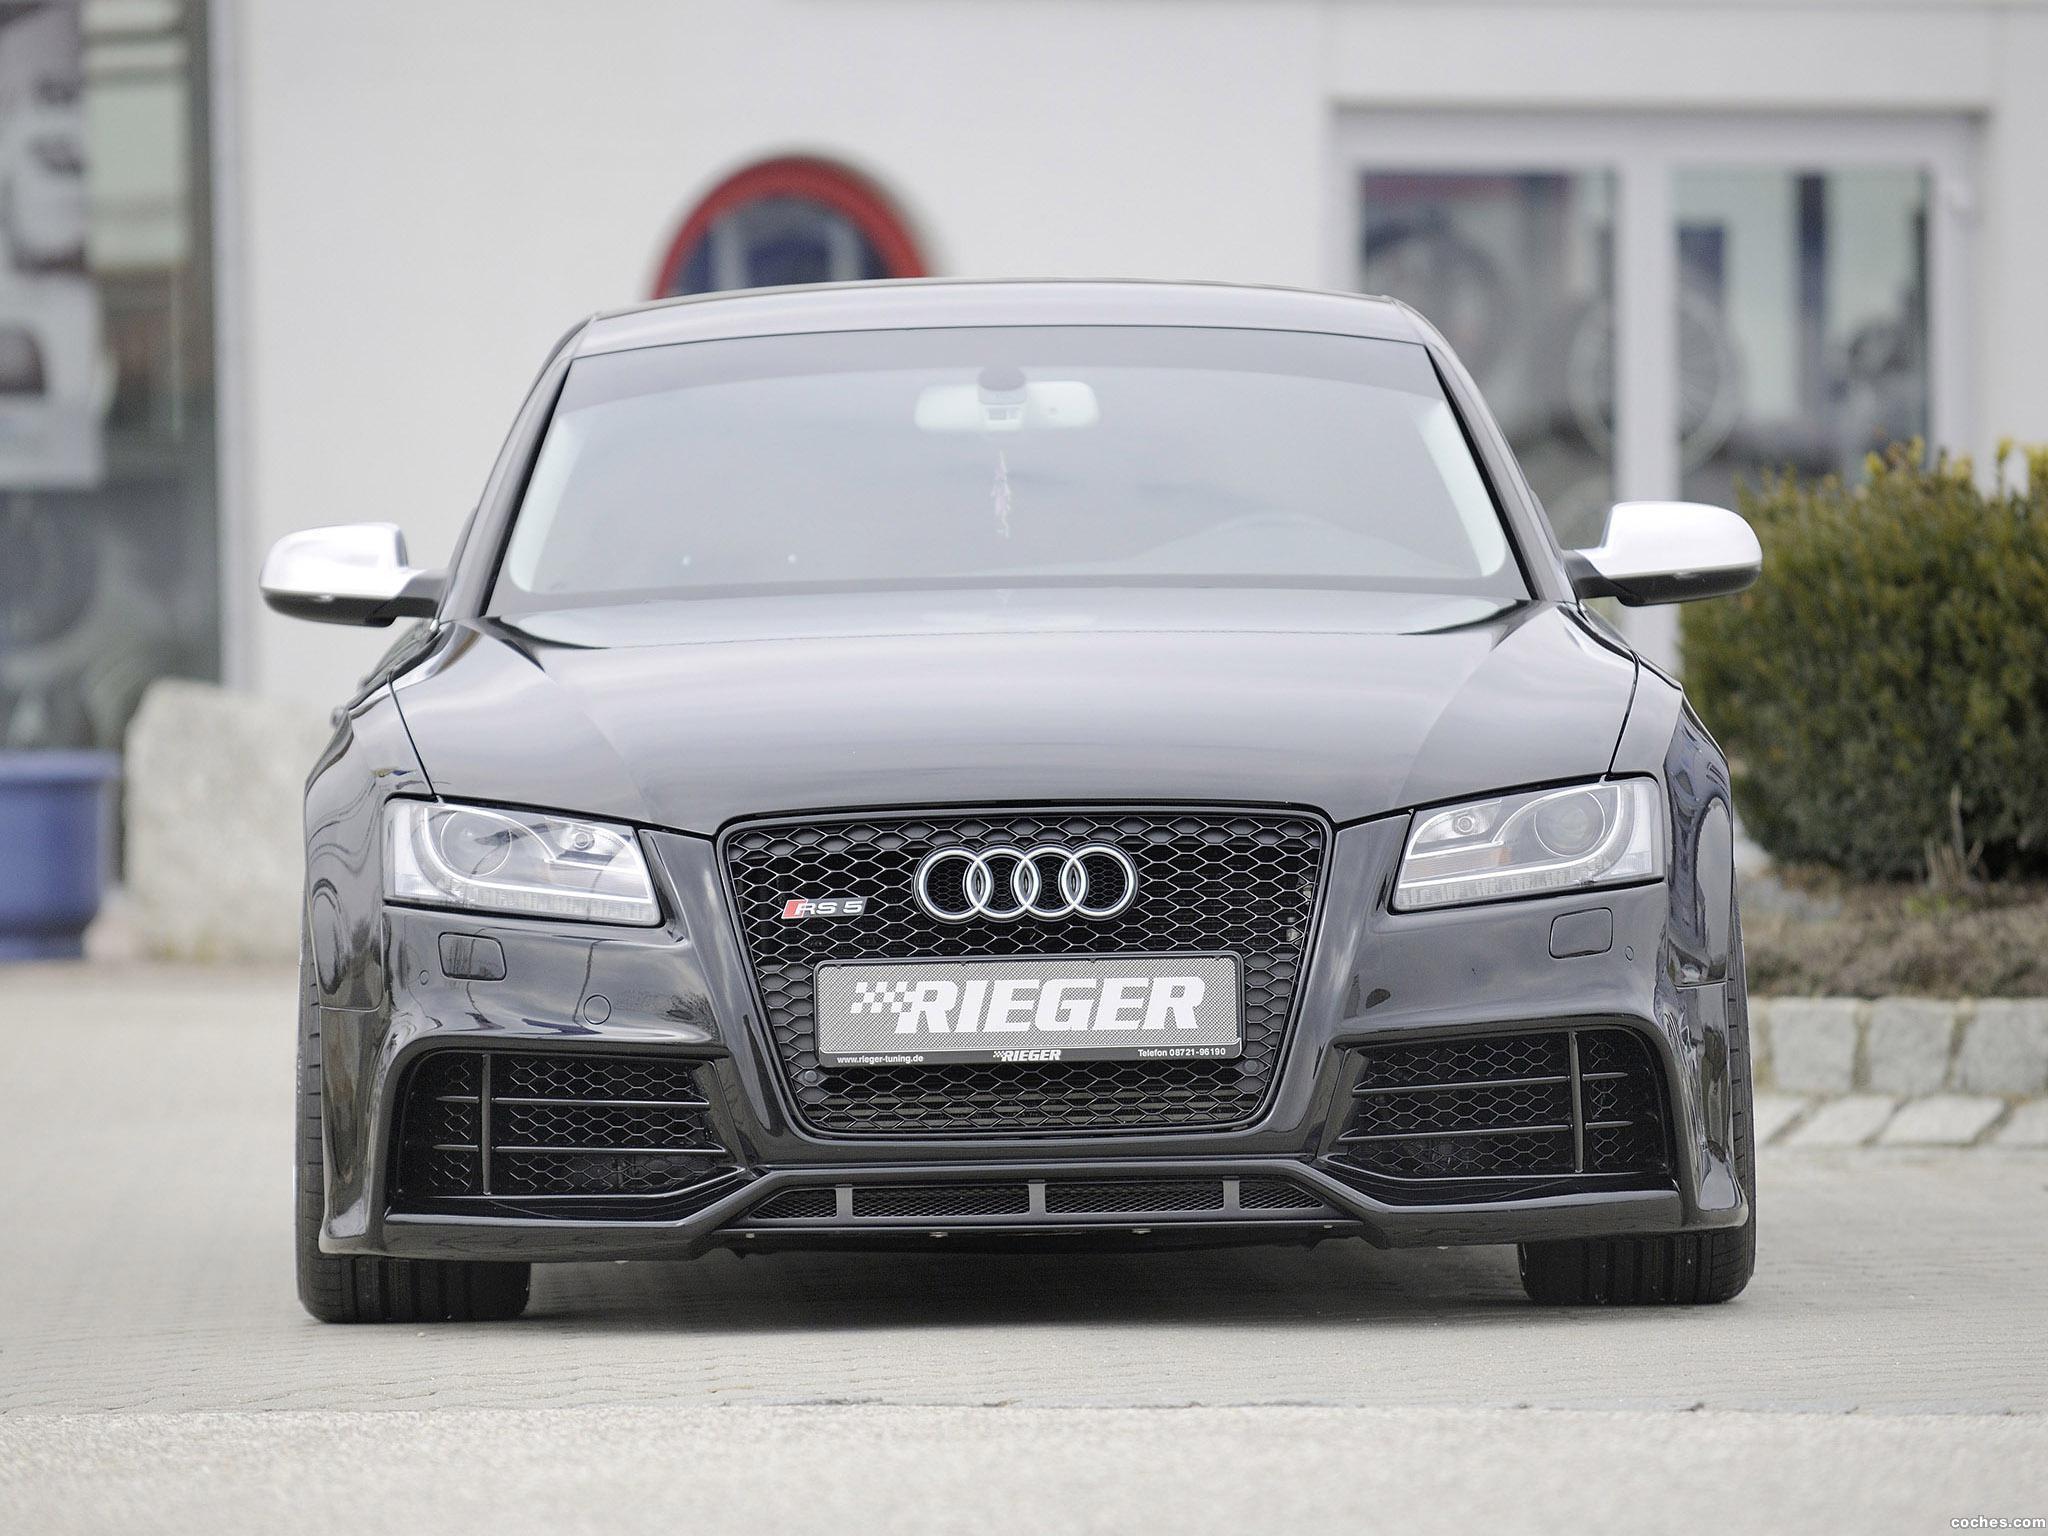 Foto 0 de Audi Rieger A5 Sportback 2014